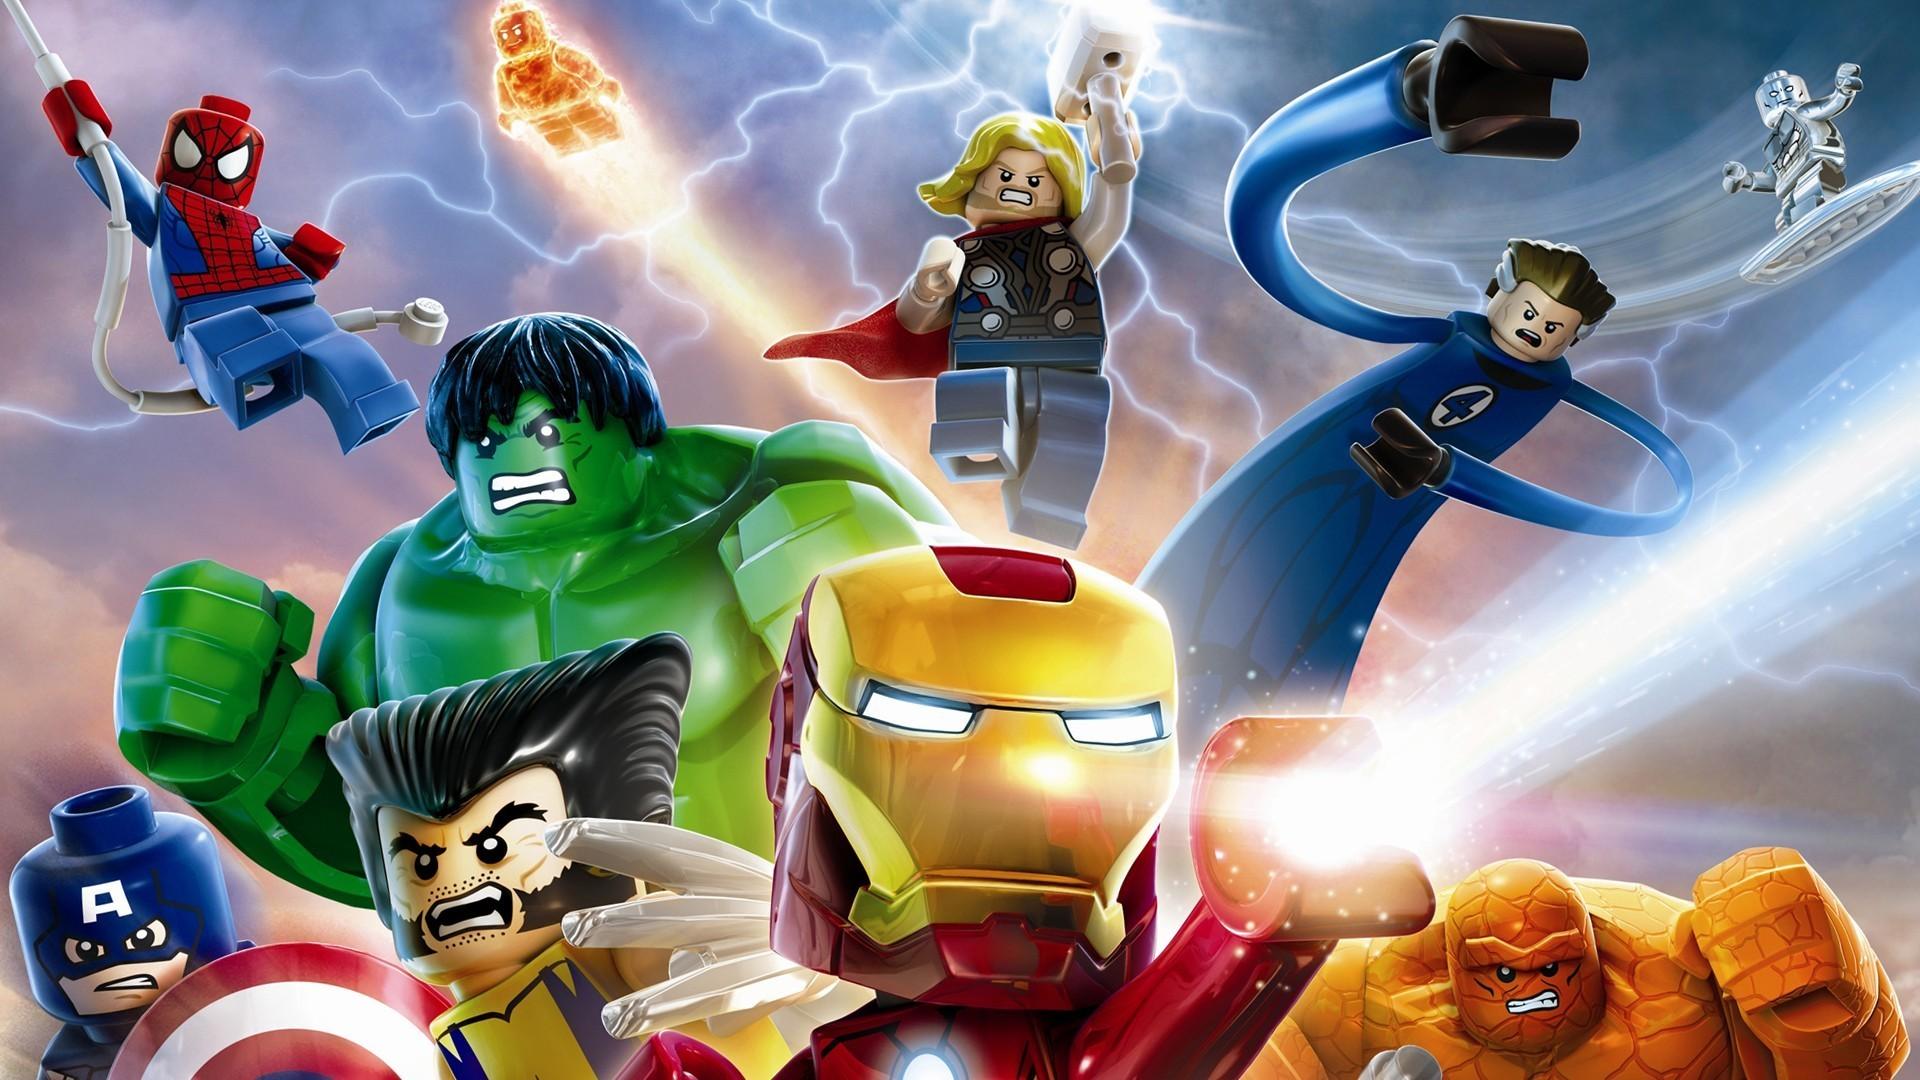 Lego Marvel Superheroes Hulk and Captain America Wallpaper | game hd  wallpaper | Pinterest | Captain america wallpaper, Lego marvel and Hulk